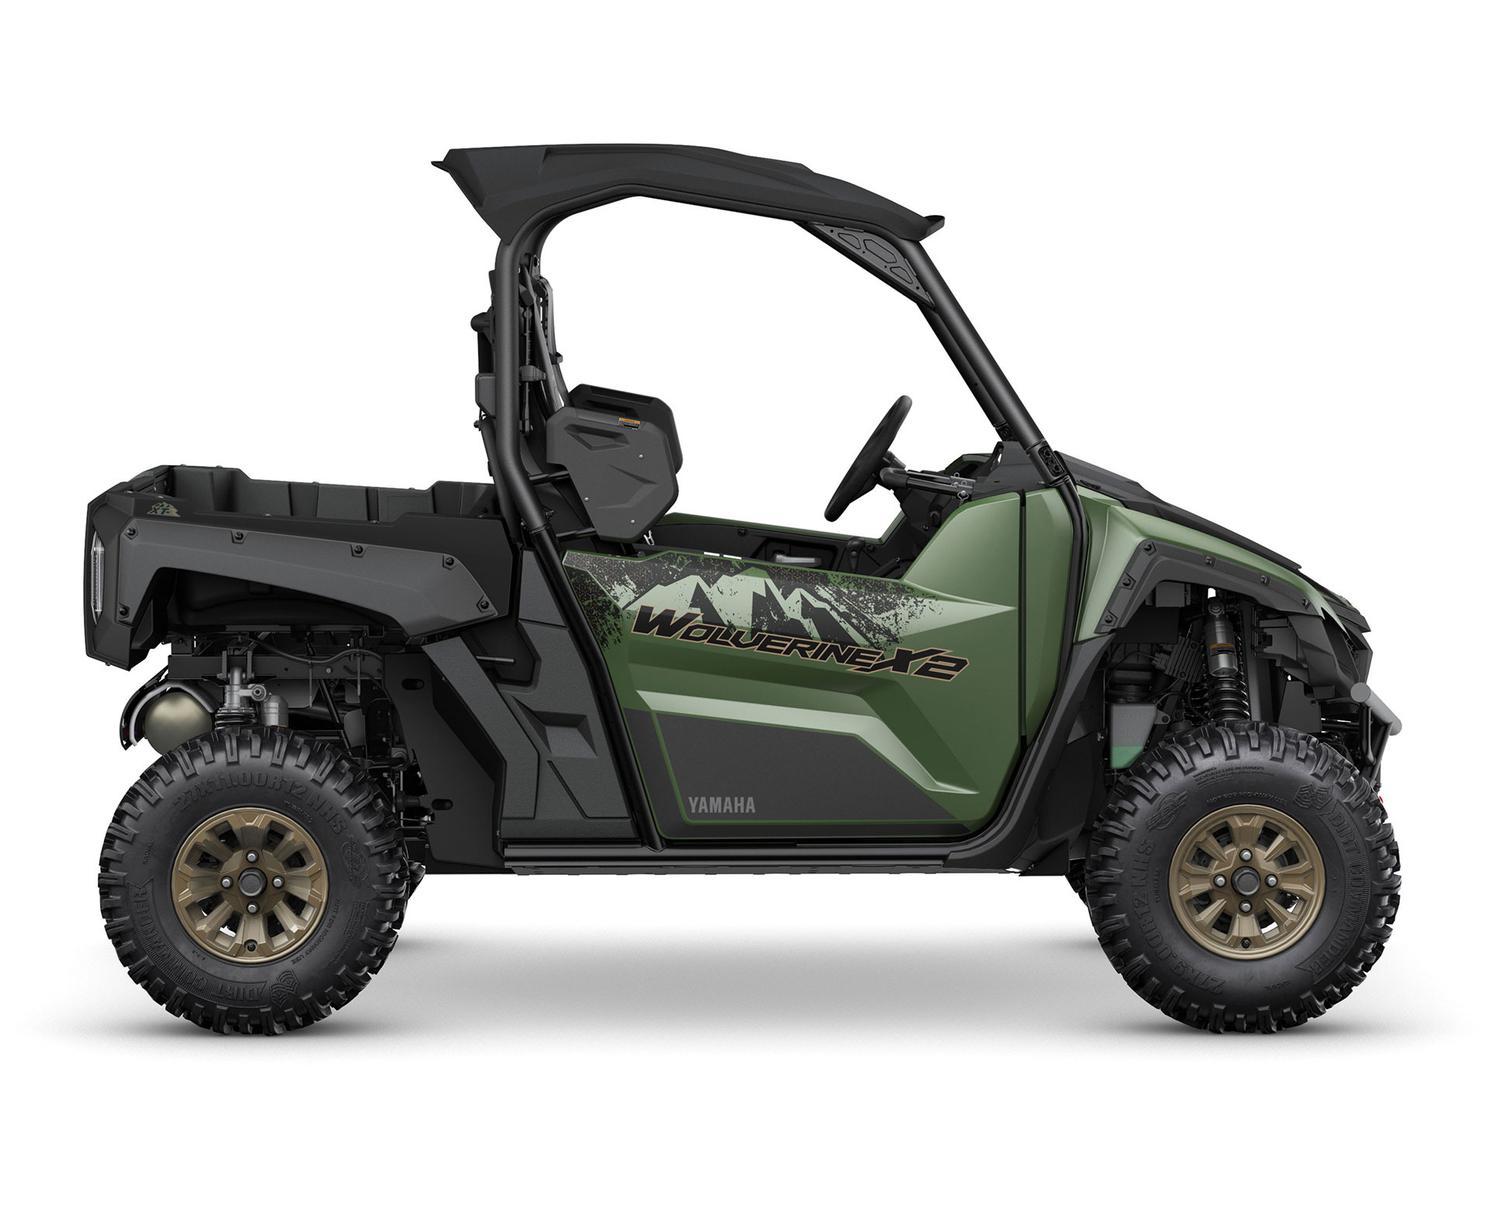 2021 Yamaha Wolverine X2 850 EPS SE Covert Green